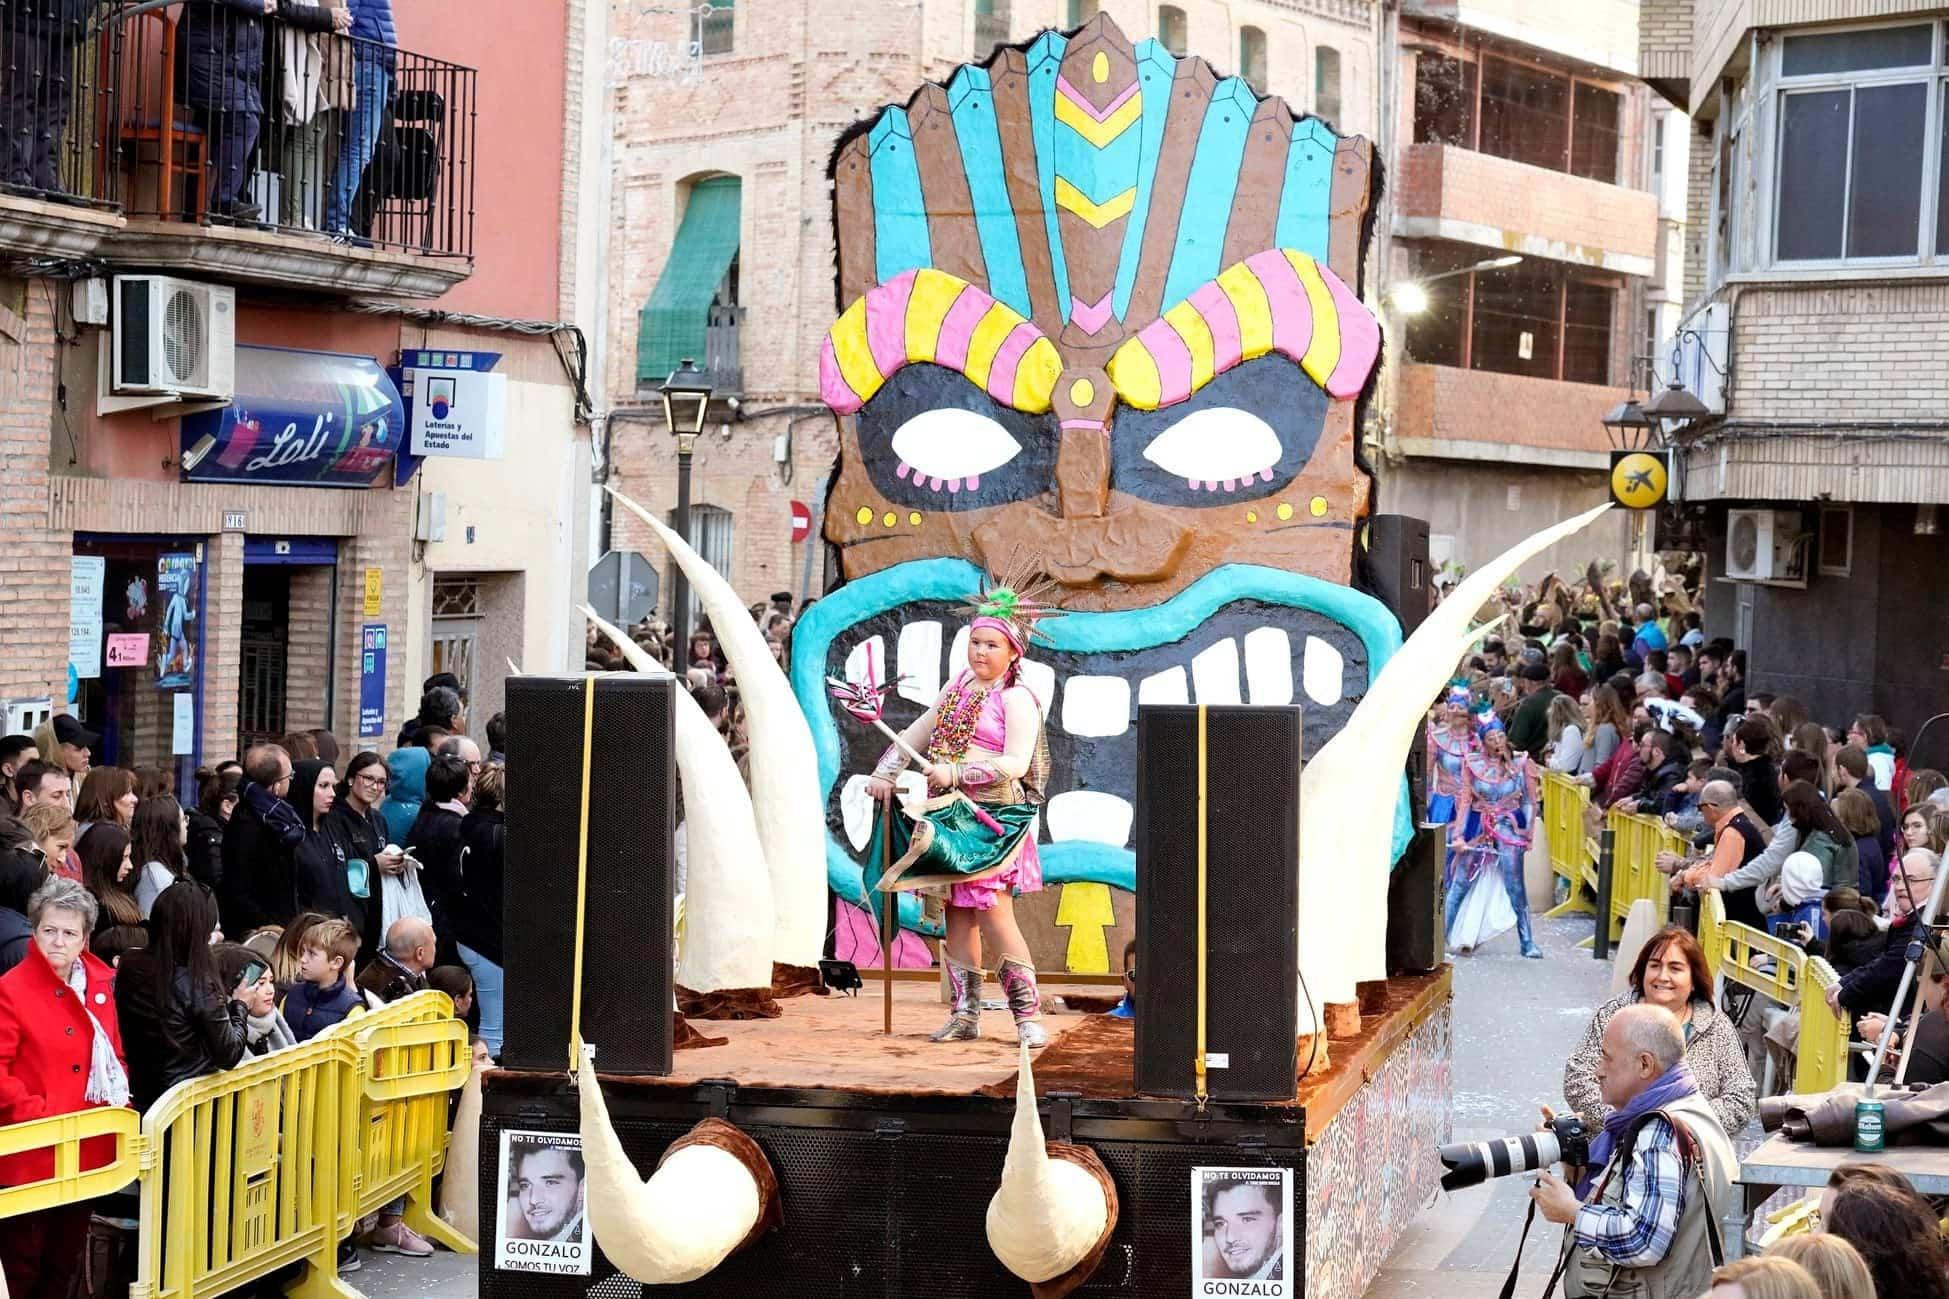 Carnaval de herencia 2020 ofertorio 36 - Selección de fotografías del Ofertorio del Carnaval de Herencia